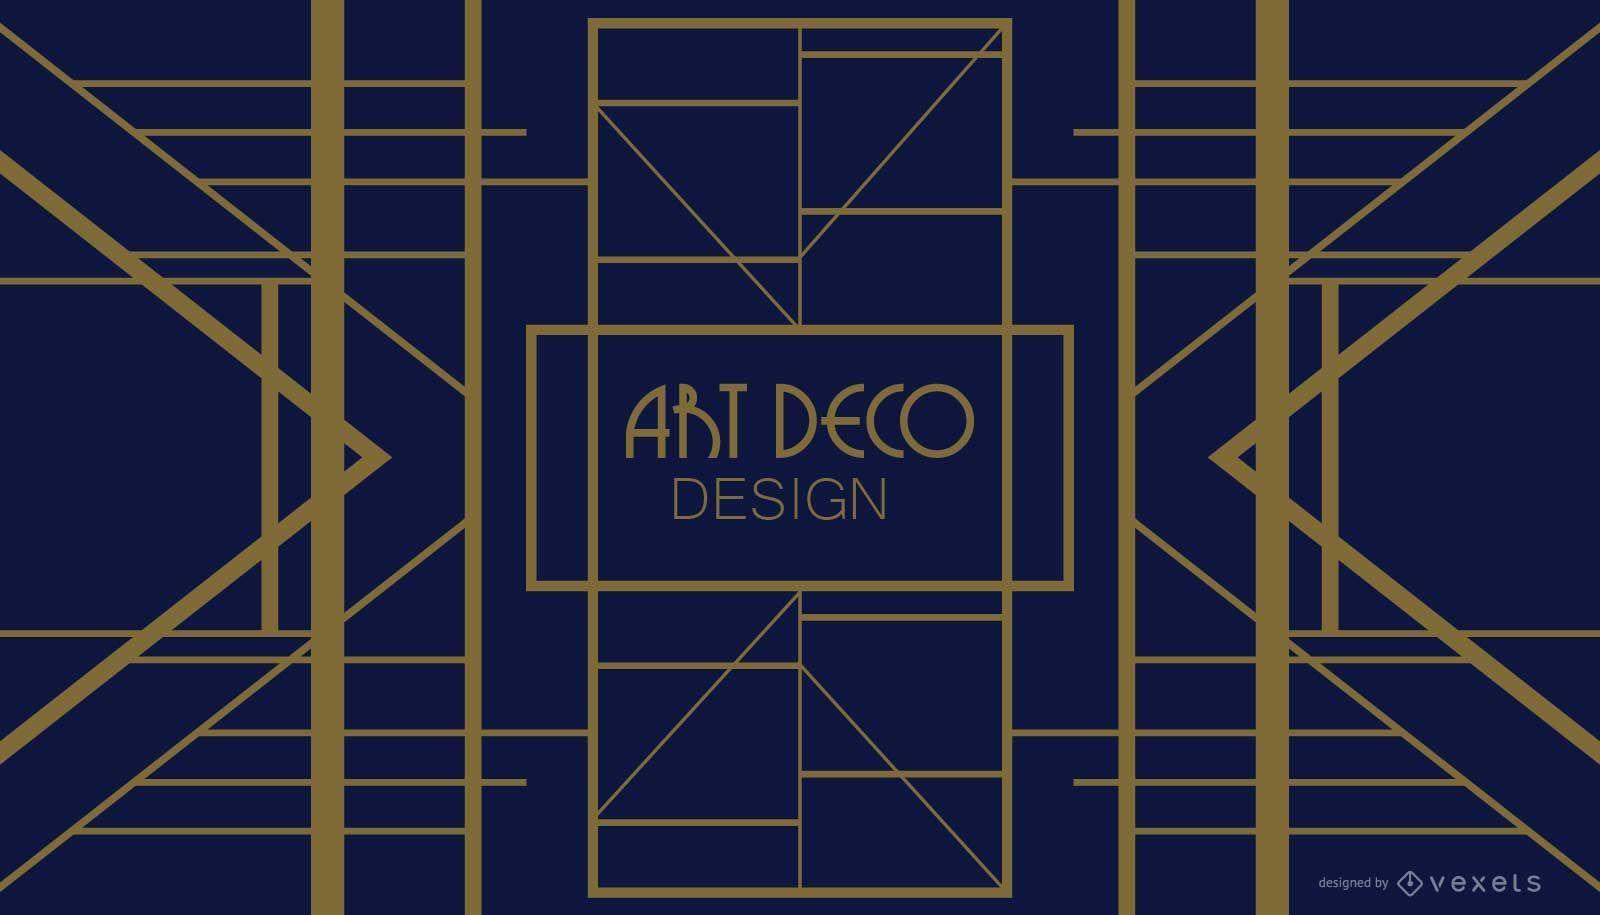 Blue and Golden Geometric Art Deco Design